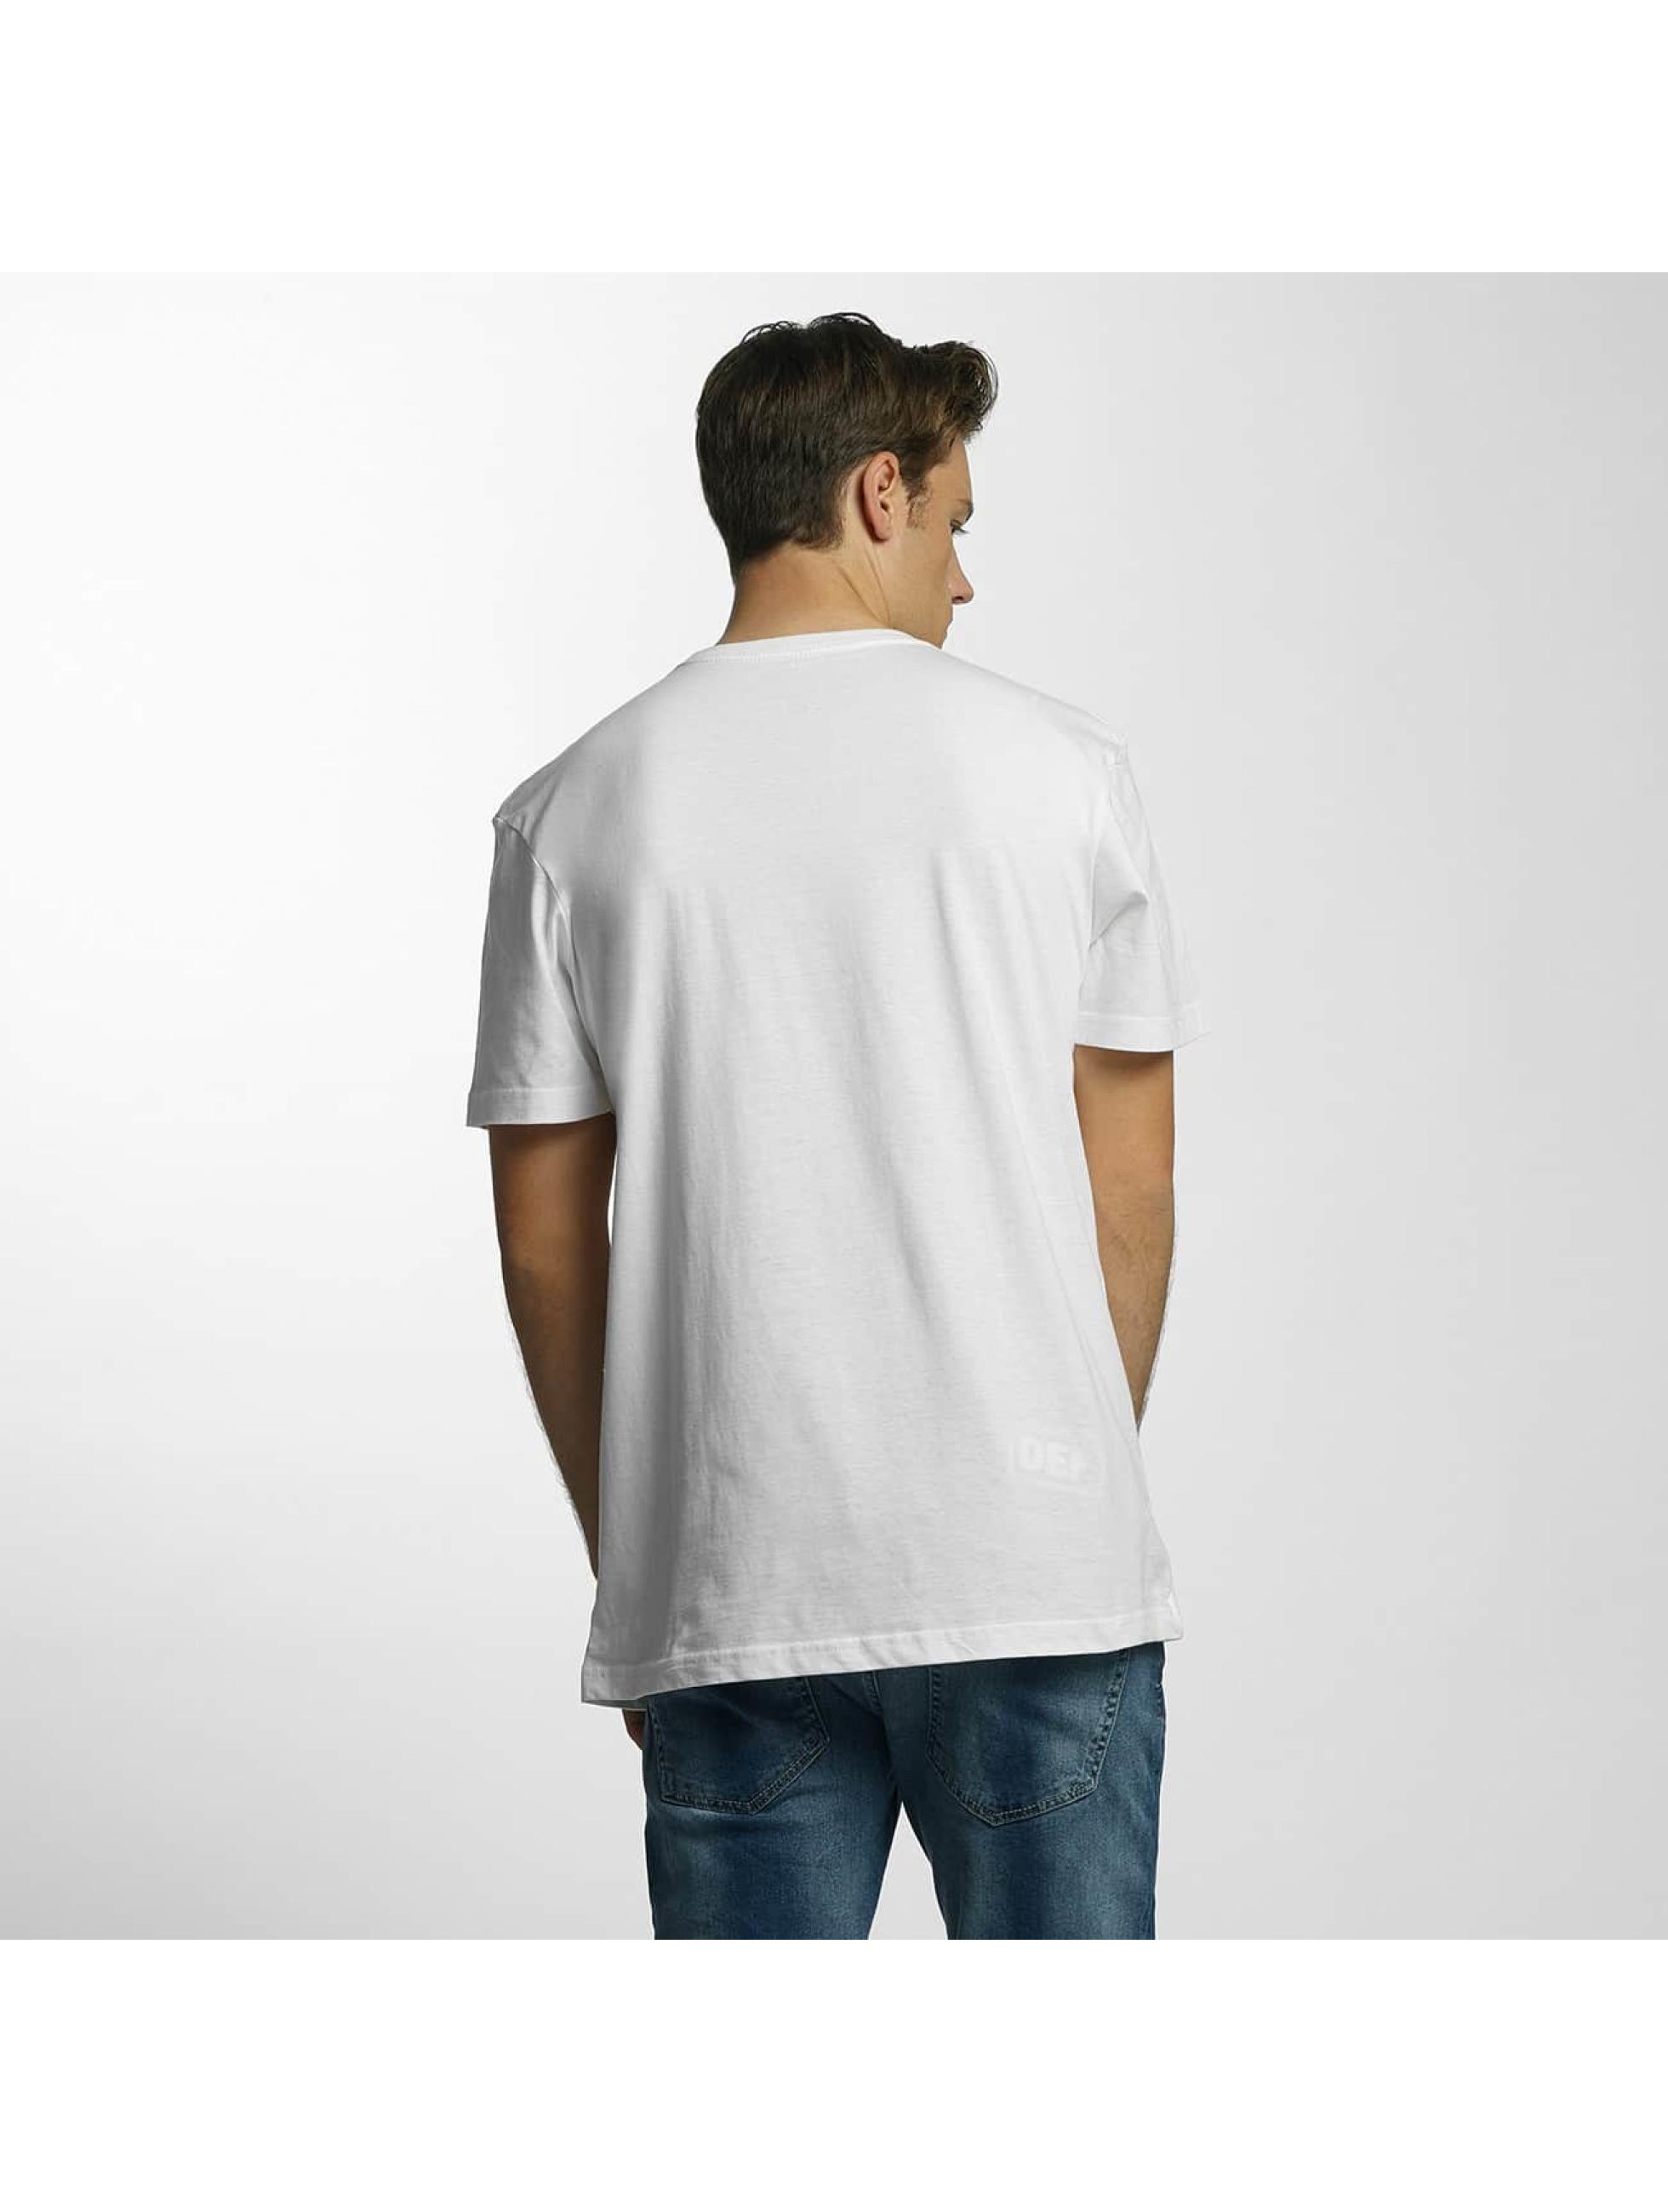 Quiksilver T-Shirt Classic Comfort Place blanc